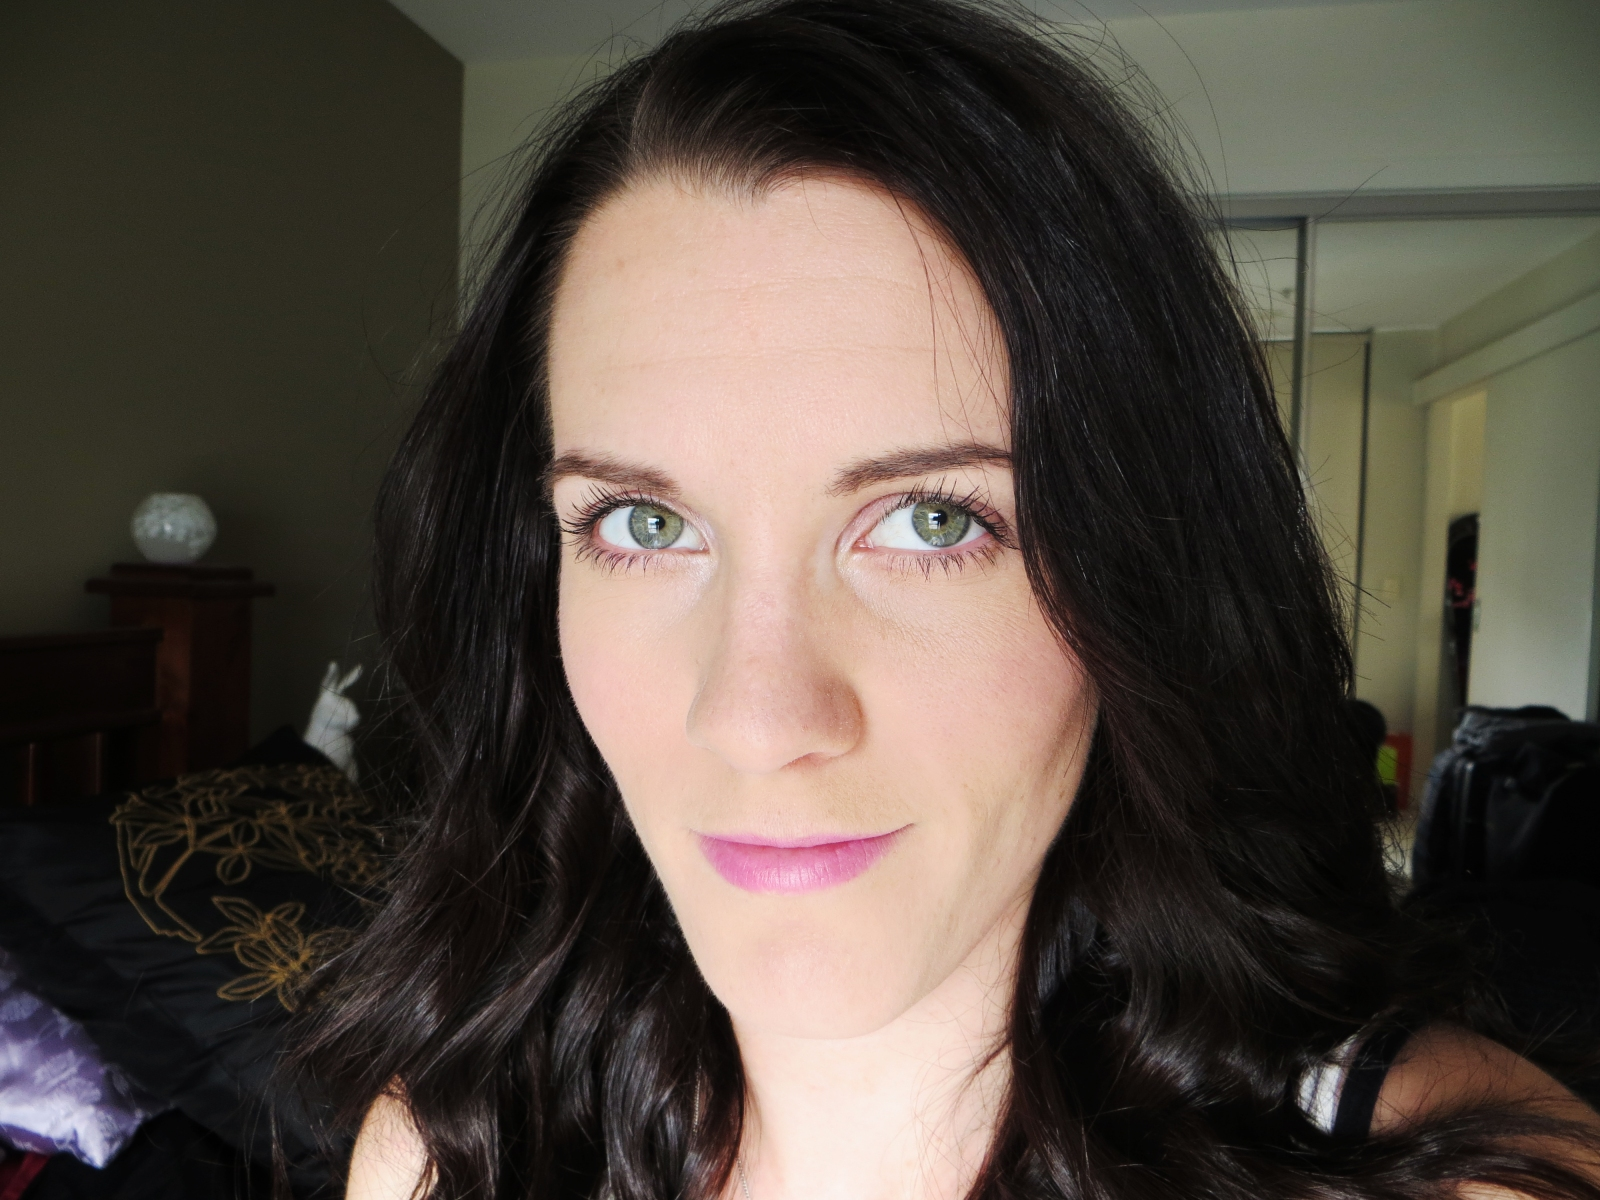 Makeup selfie #firsttimeforeverything